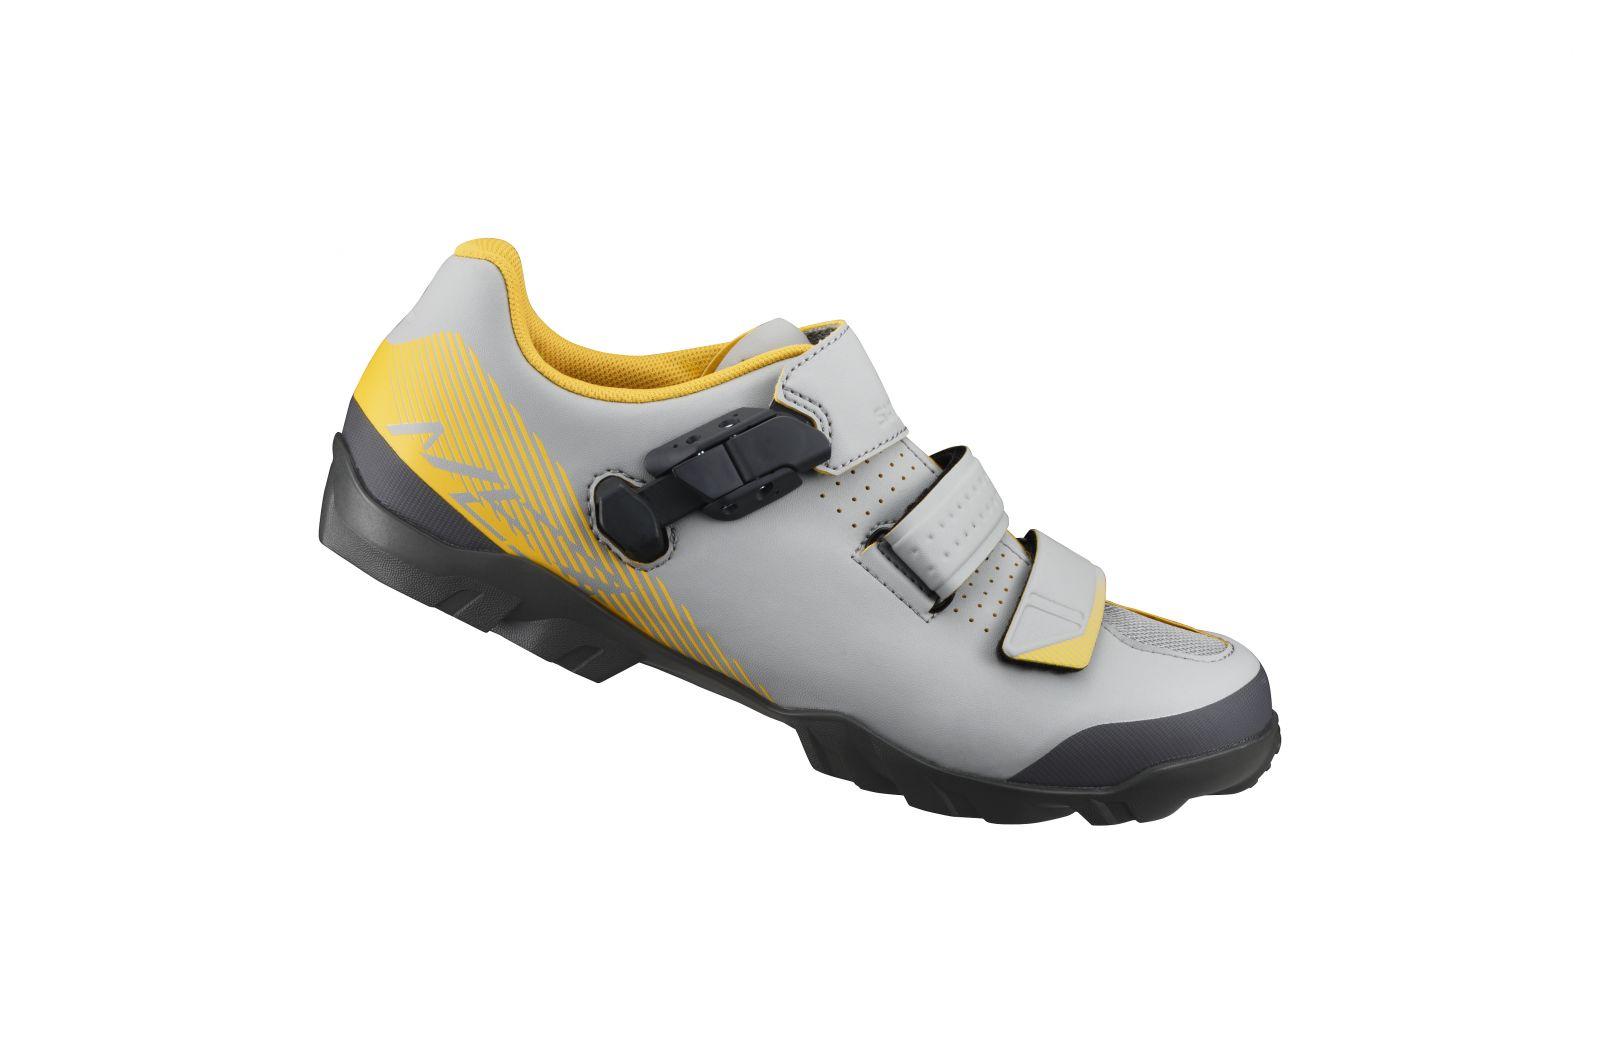 SHIMANO MTB obuv SH-ME300MG, šedá žlutá, 44